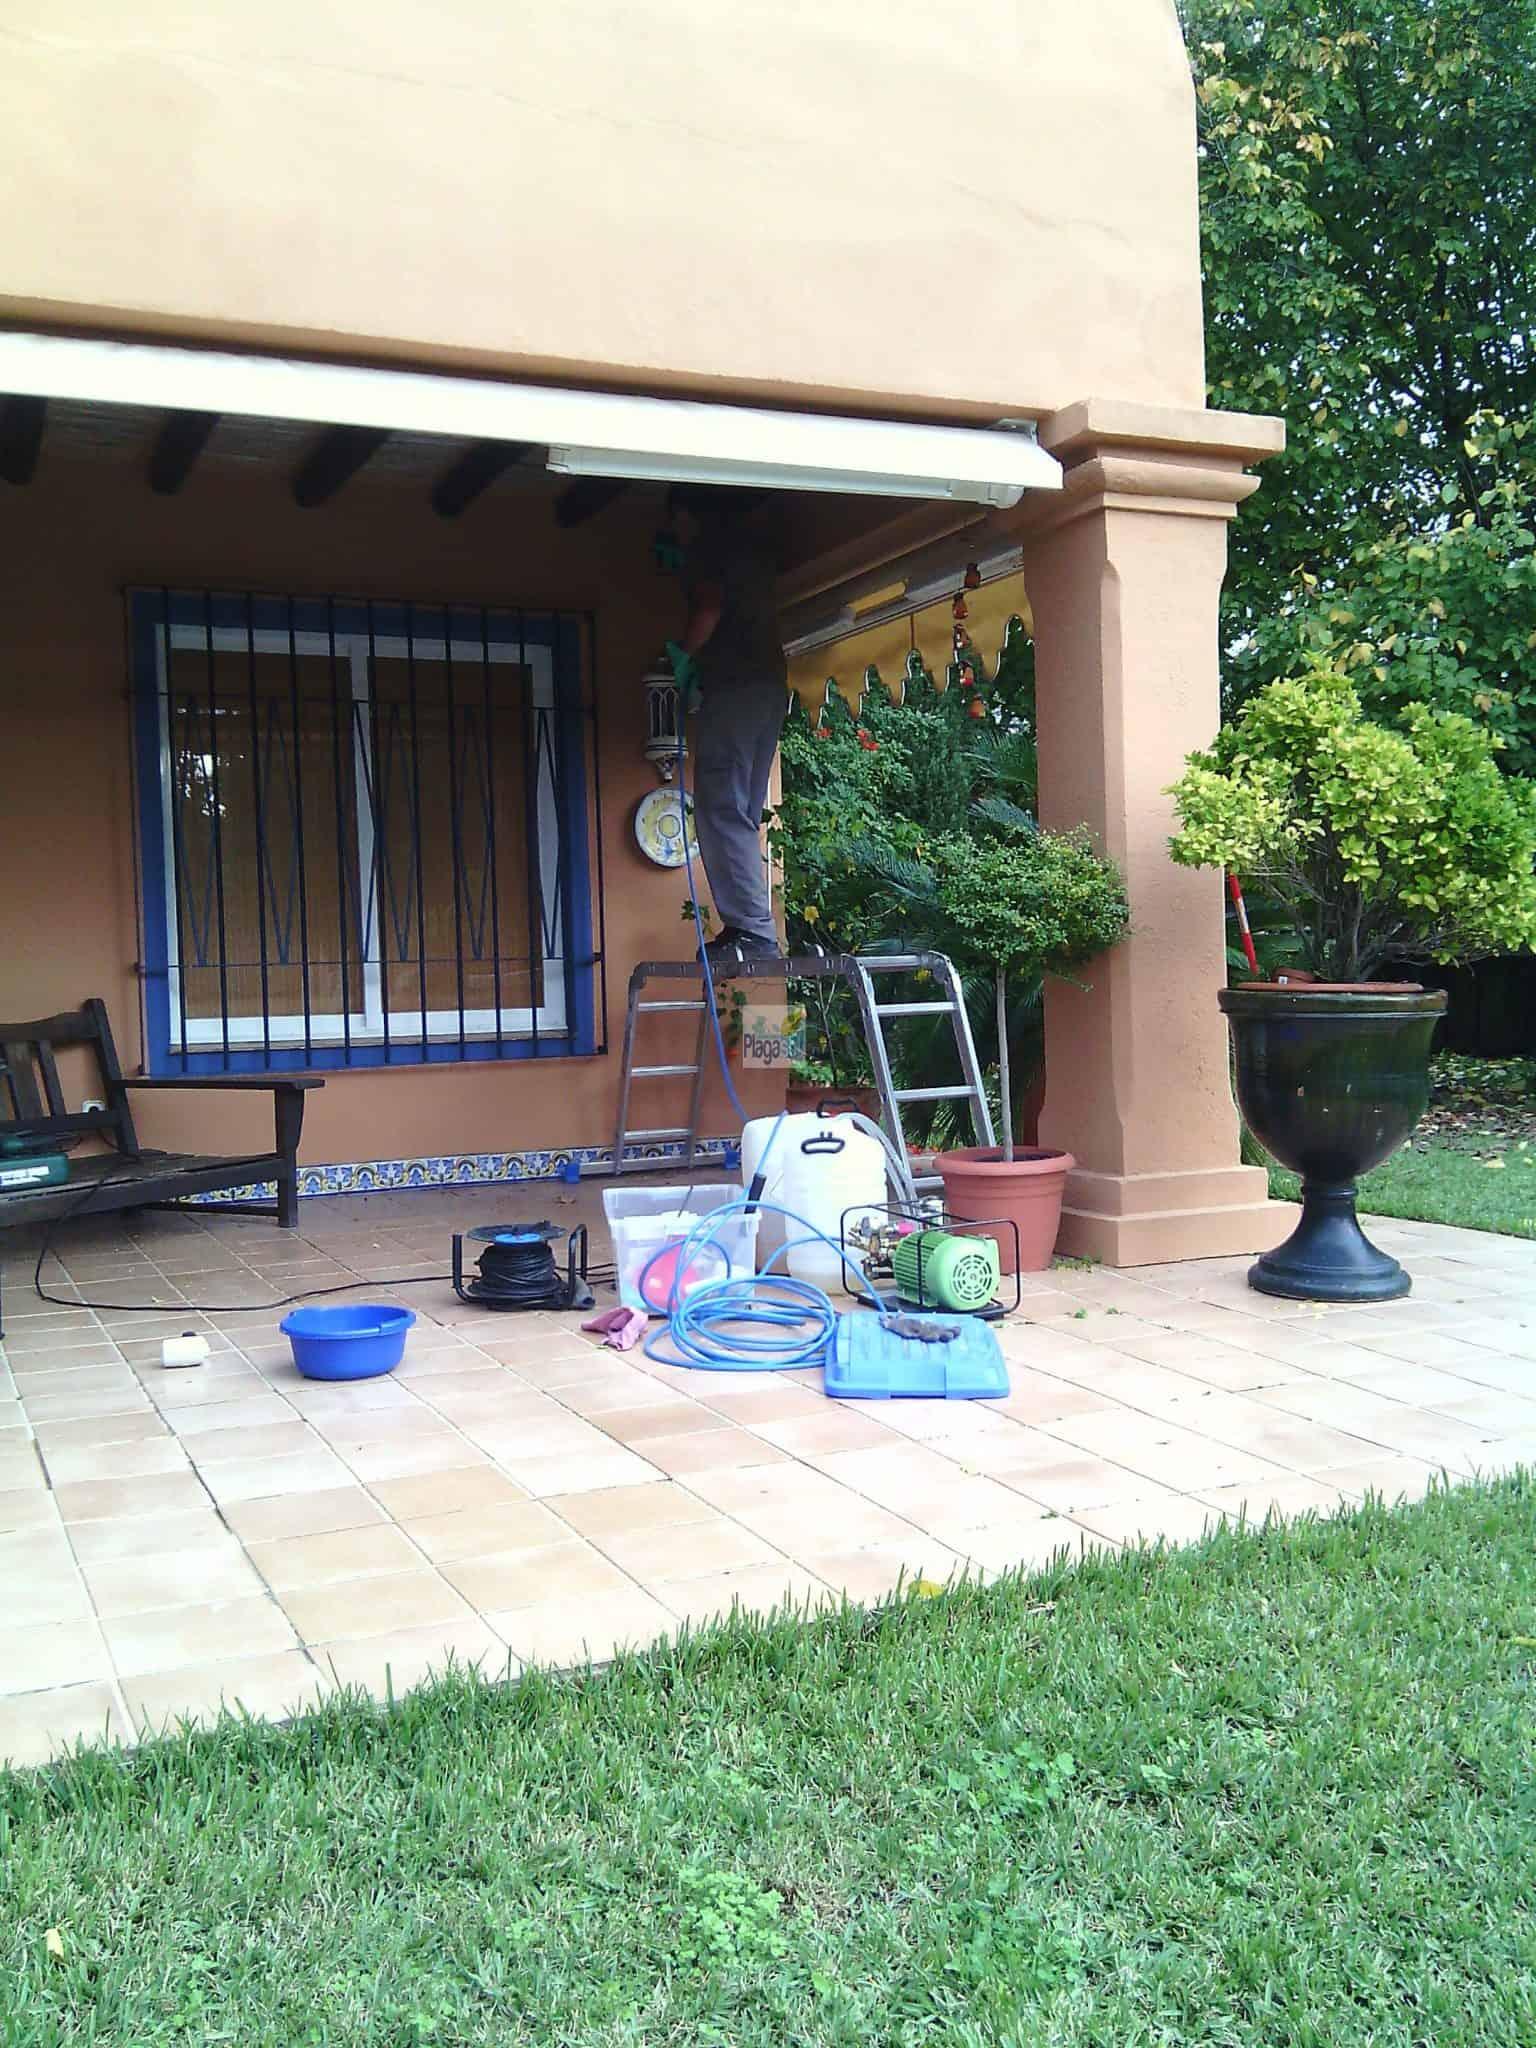 C Mo Identificar Una Plaga De Termitas En Casa O Empresa ~ Como Matar Termitas De Forma Casera